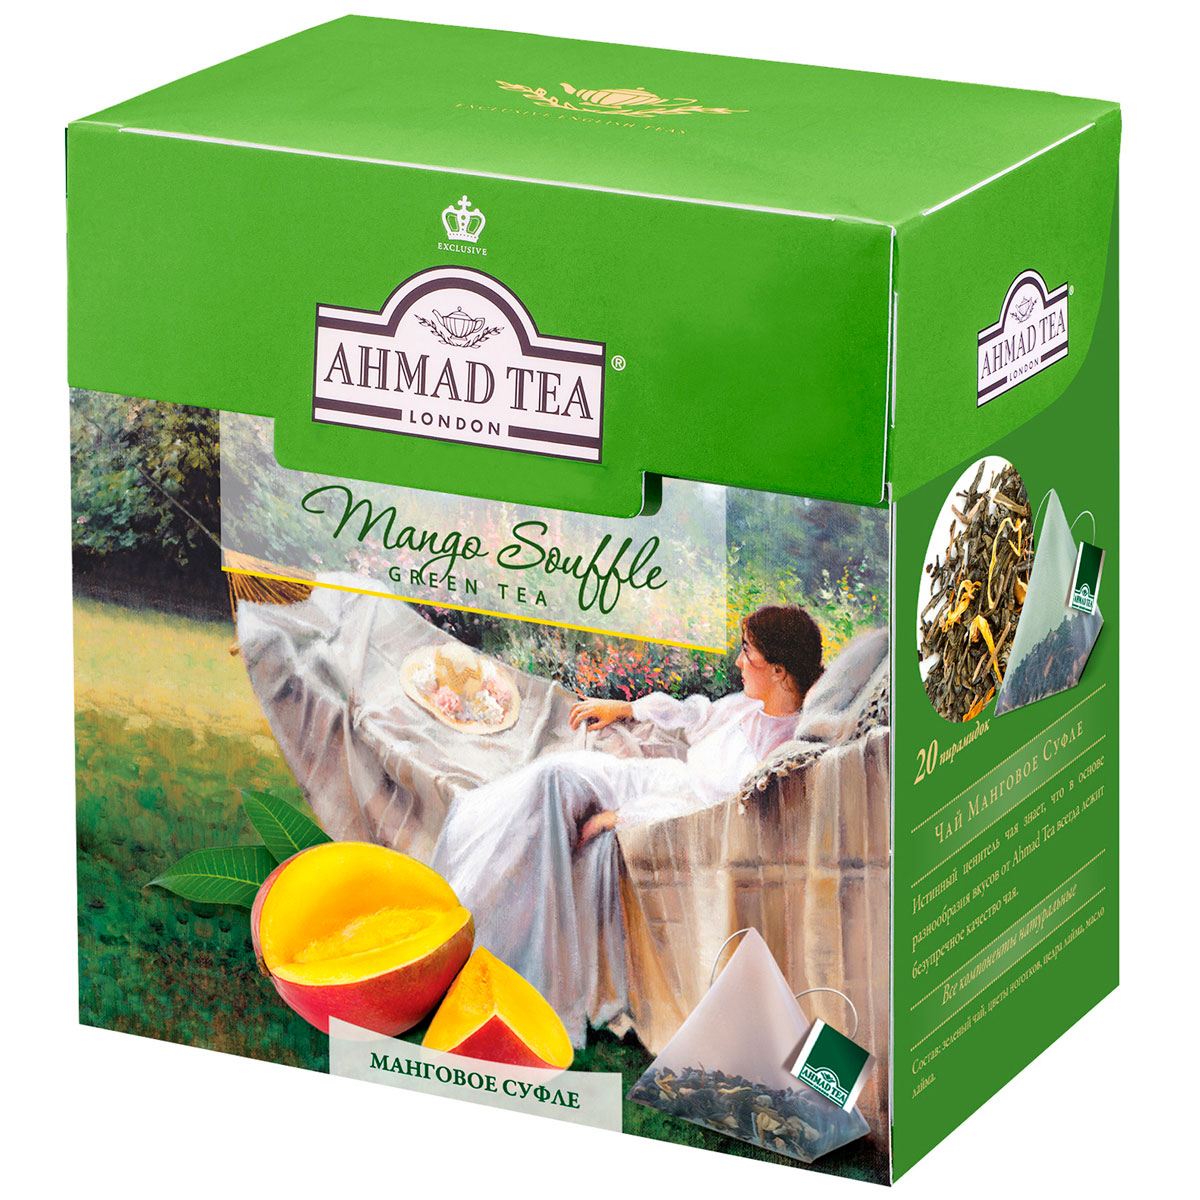 Ahmad Tea Mango Souffle зеленый чай в пирамидках, 20 шт ahmad tea weekend collection набор чая в пирамидках 3 вкуса 108 г